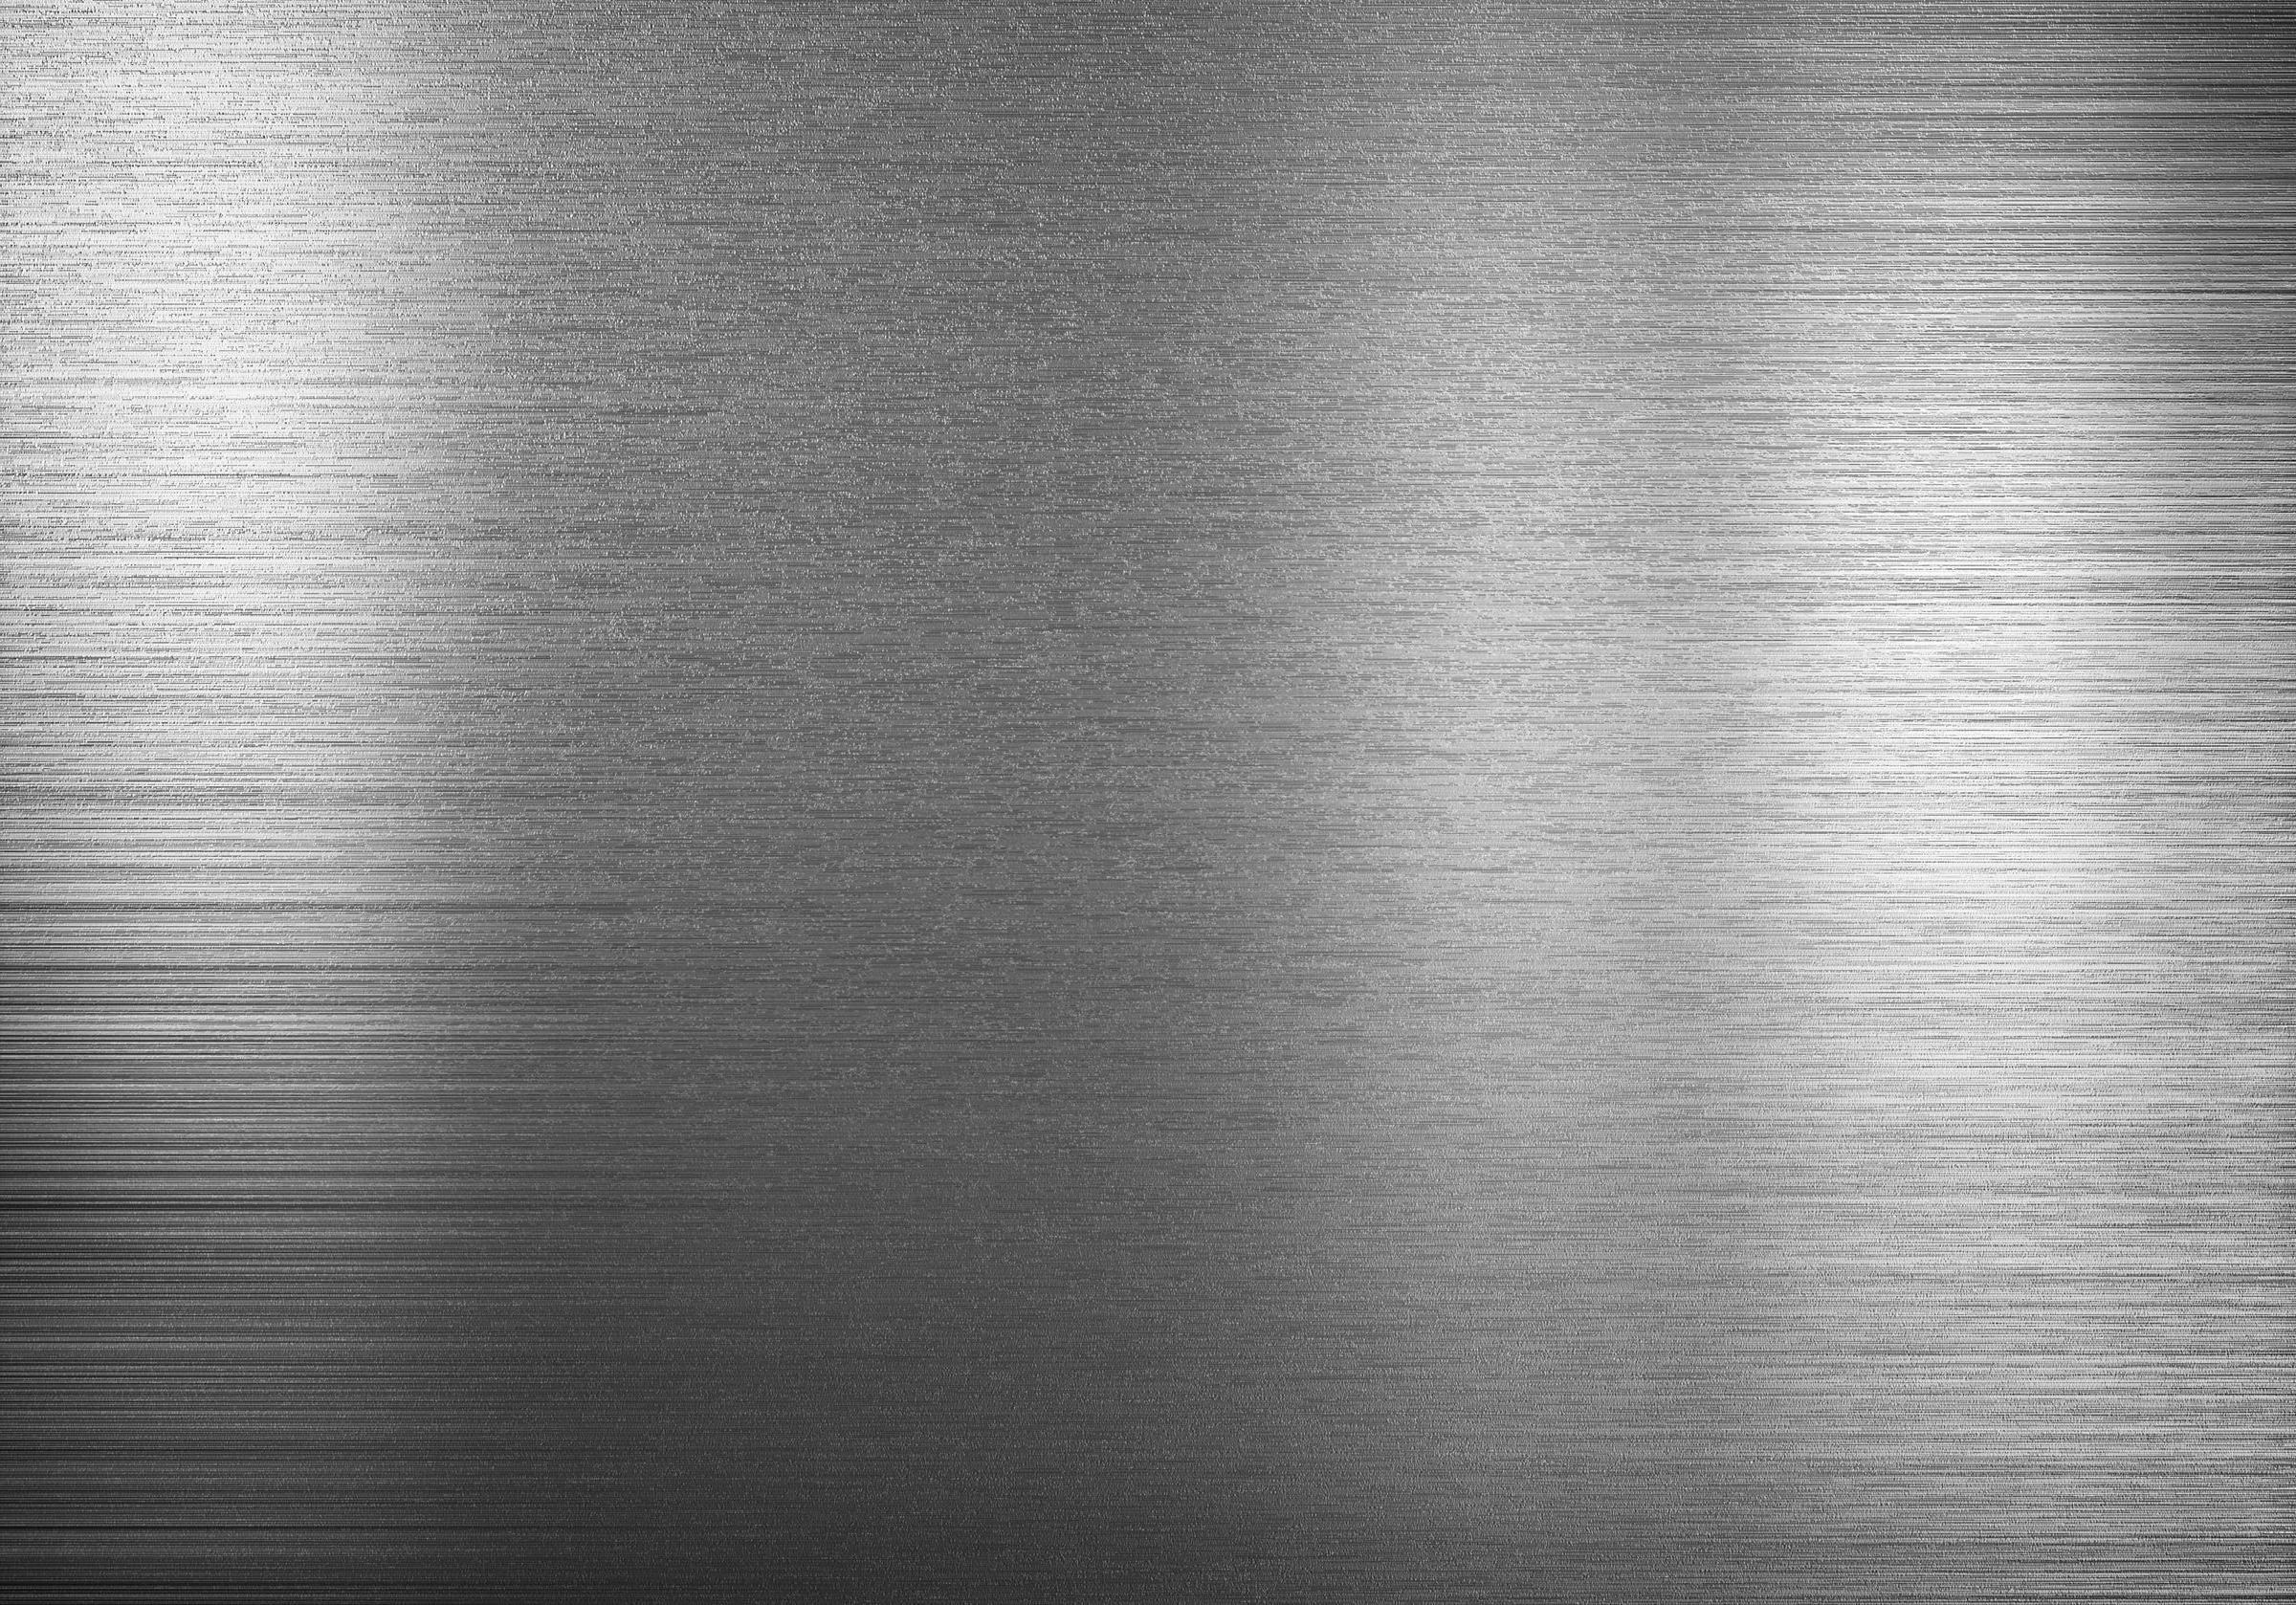 Baby Girl Hd Wallpaper Download Metallic Silver Wallpaper 28 Images